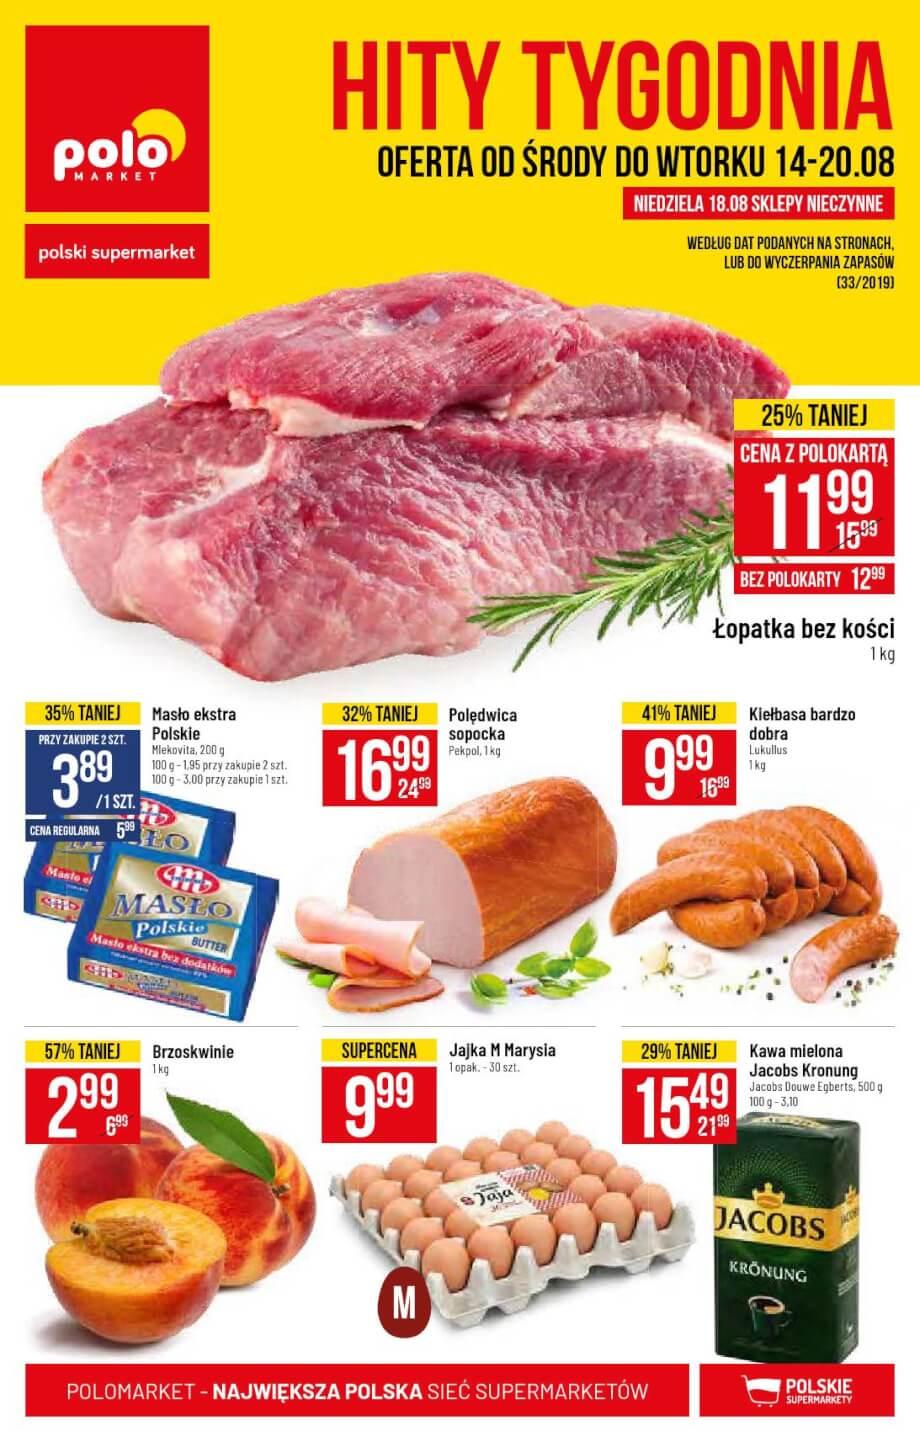 Polomarket, gazetka do 20.08.2019  s1